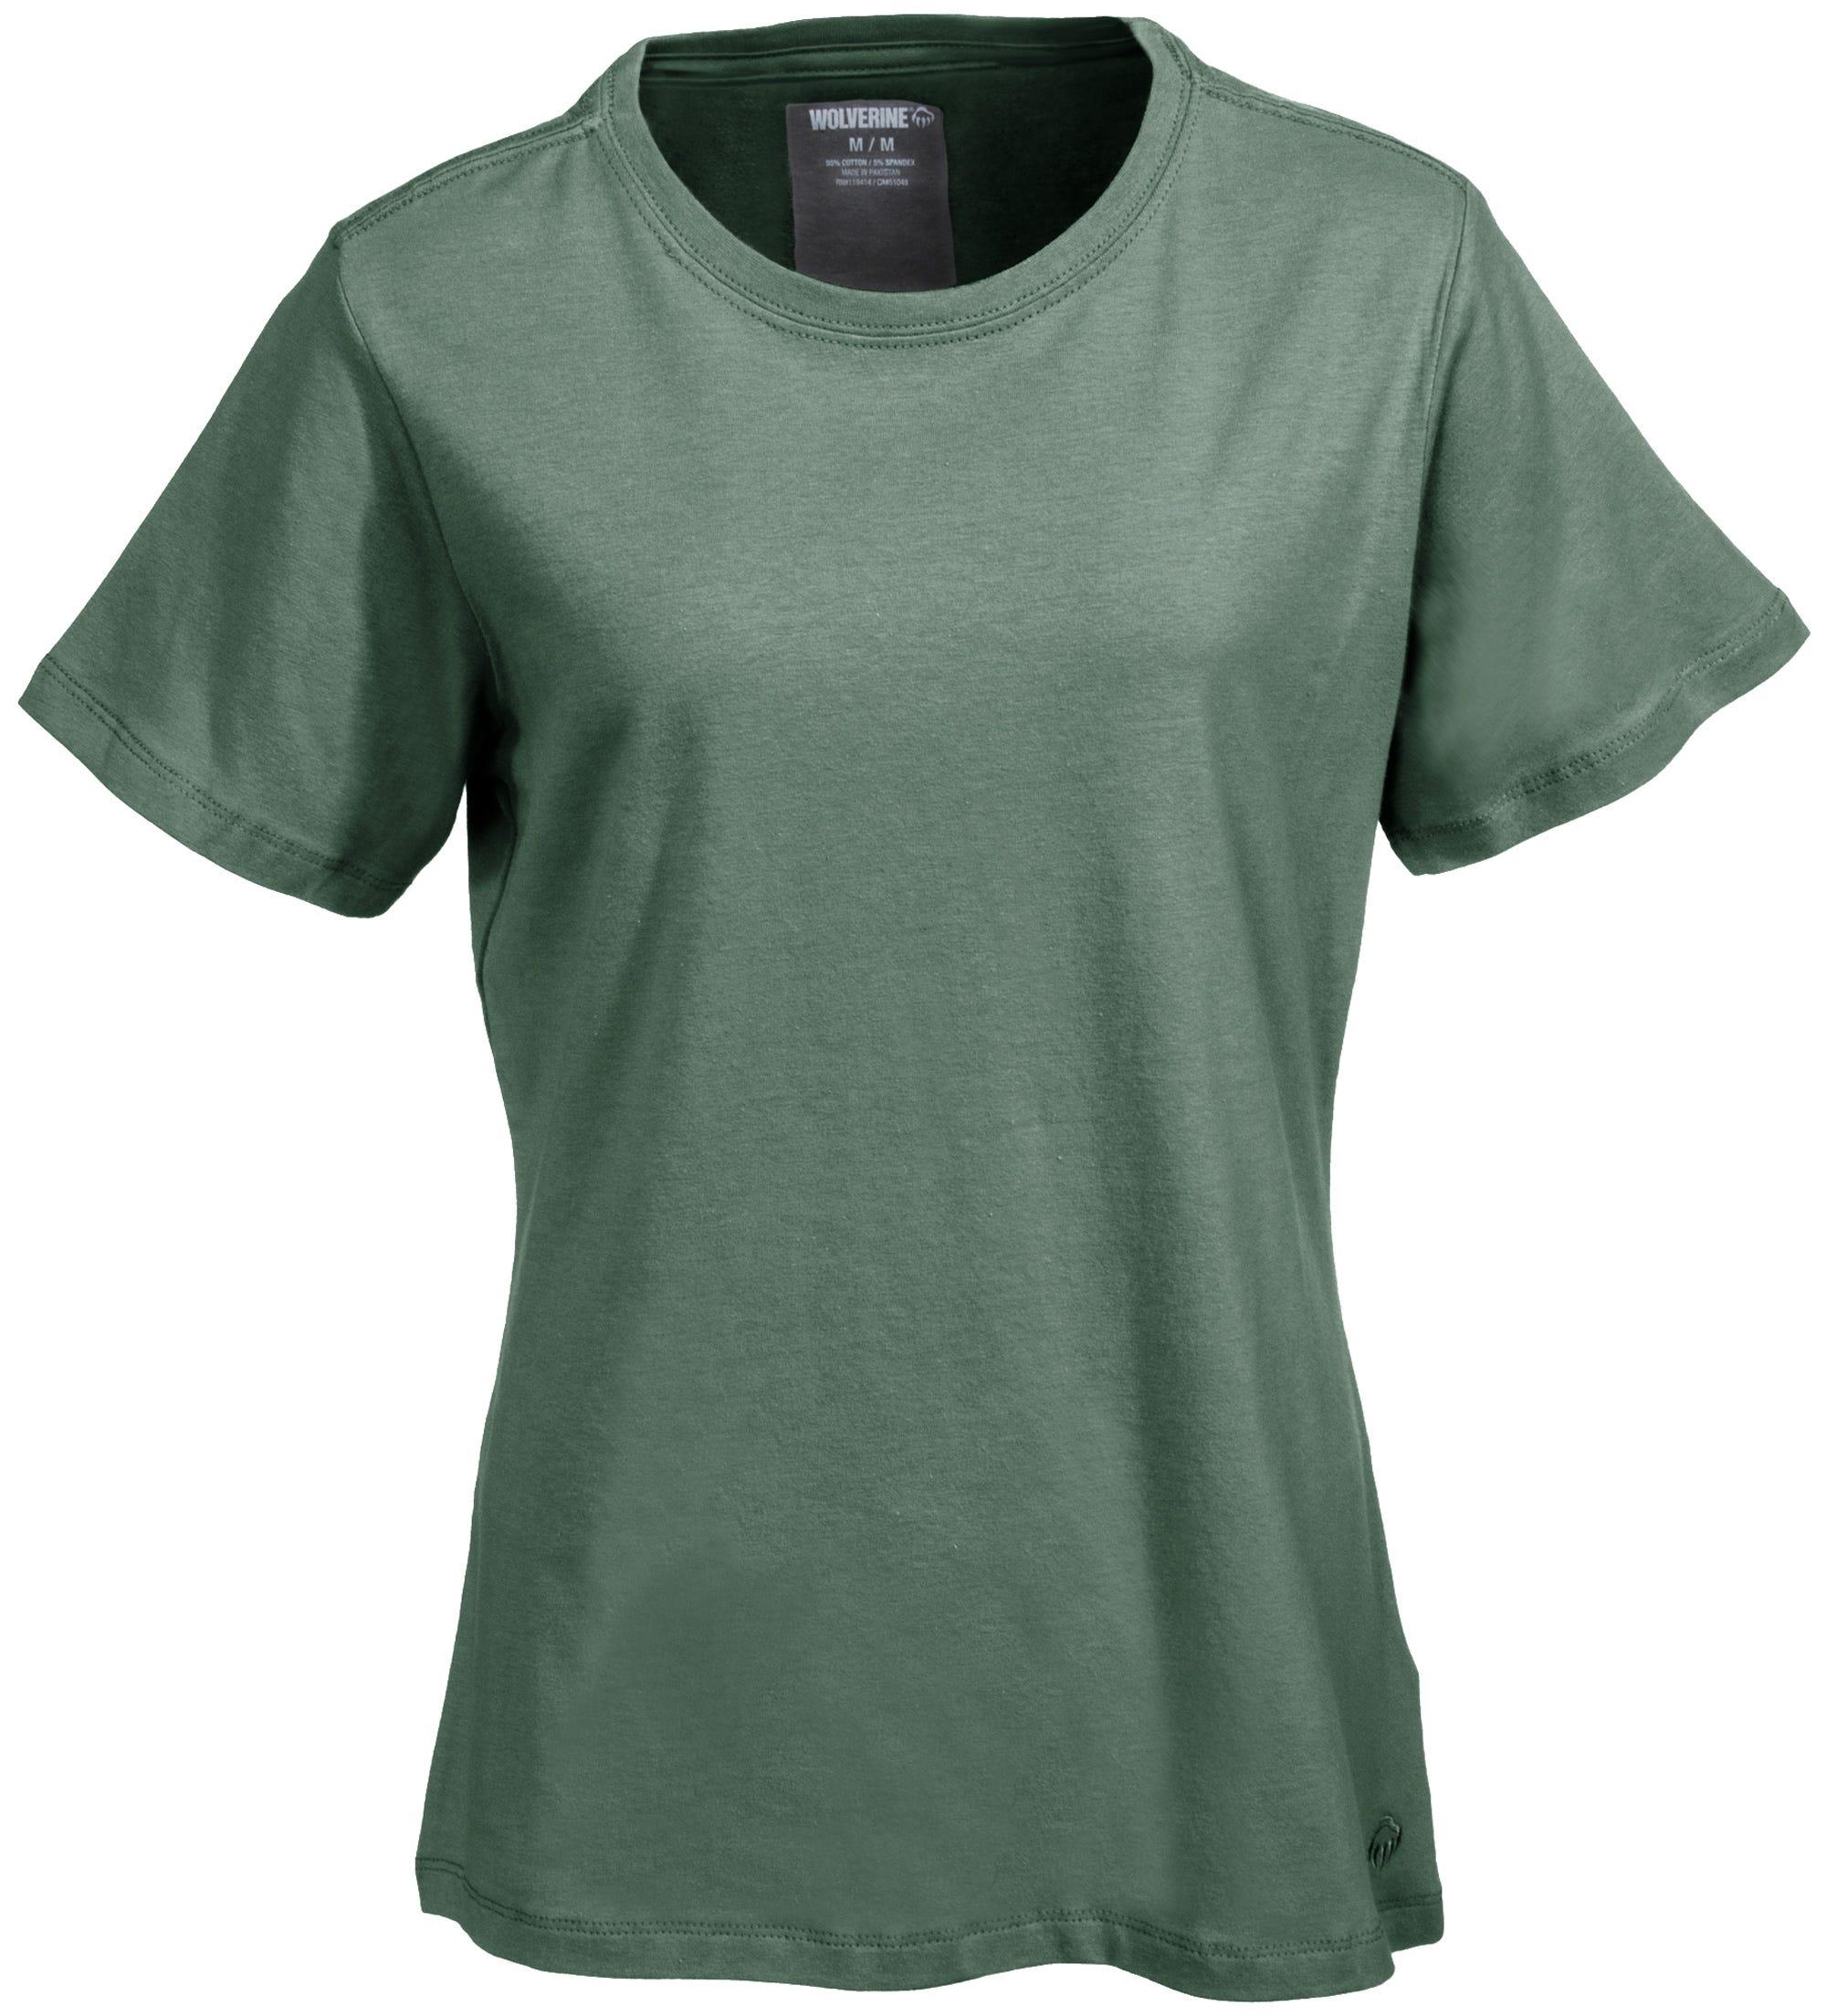 Wolverine Moisture-Wicking W1204570 344 Women's Green Lena Shirt